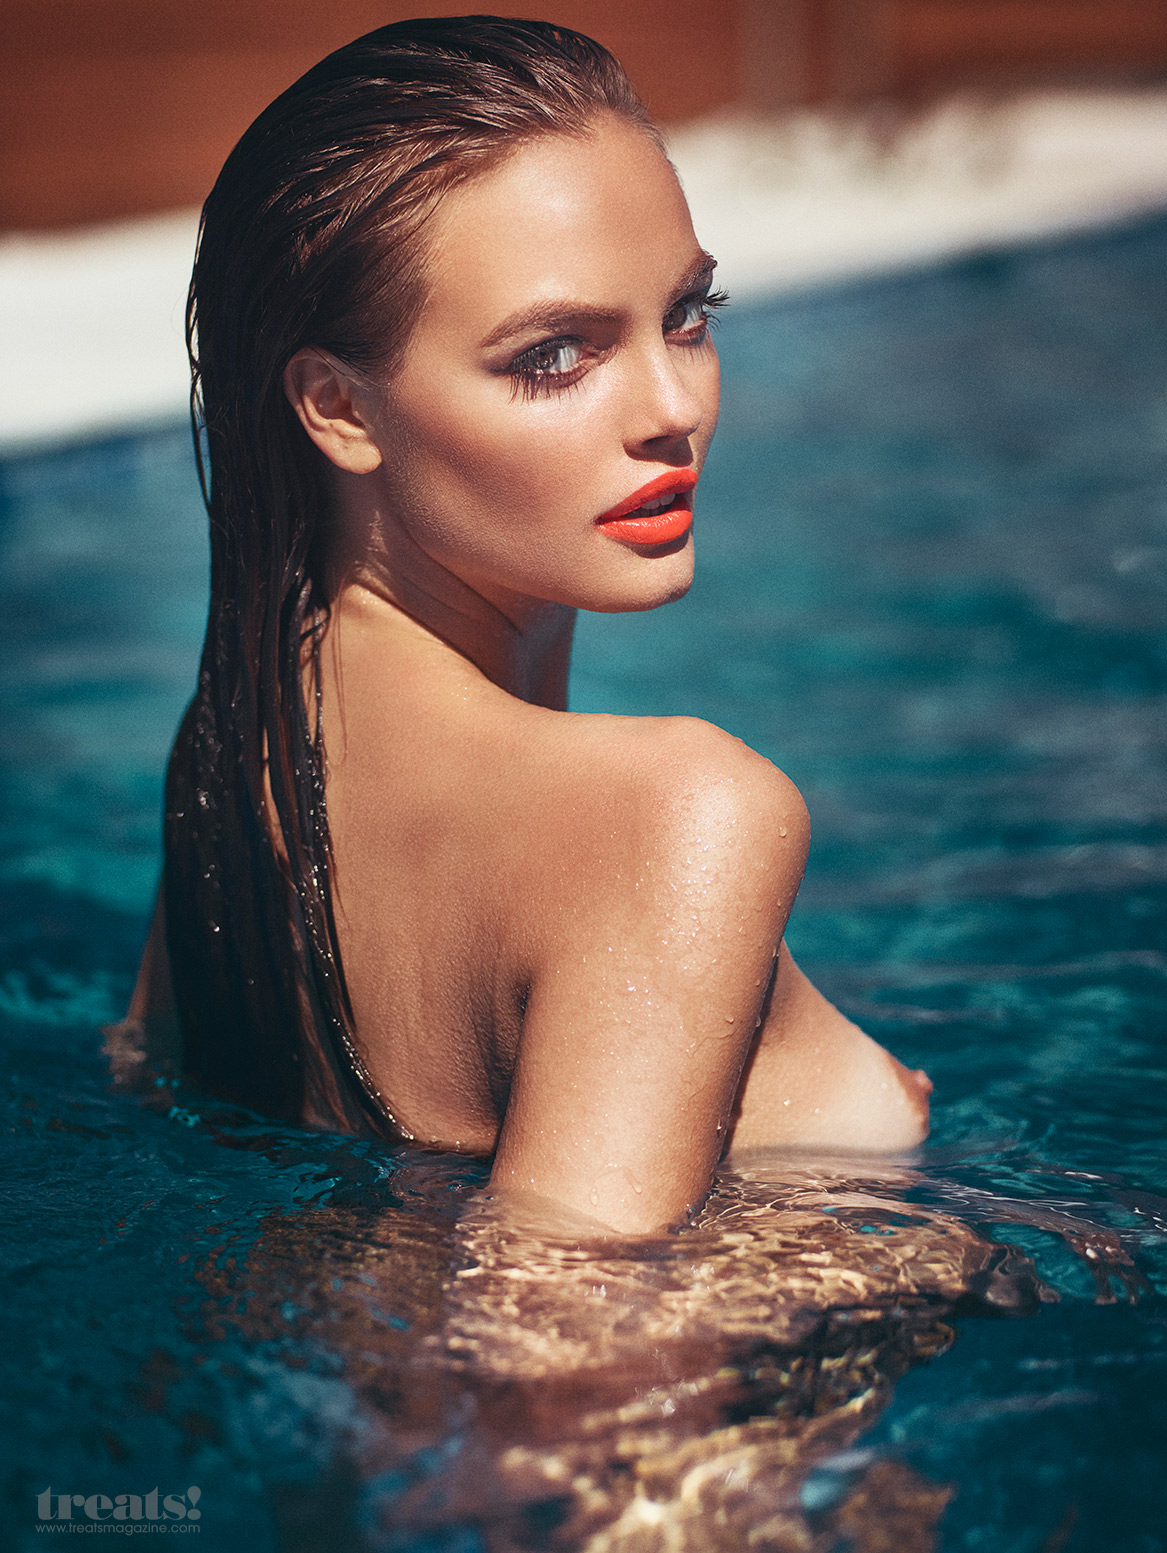 Kristina Peric Topless